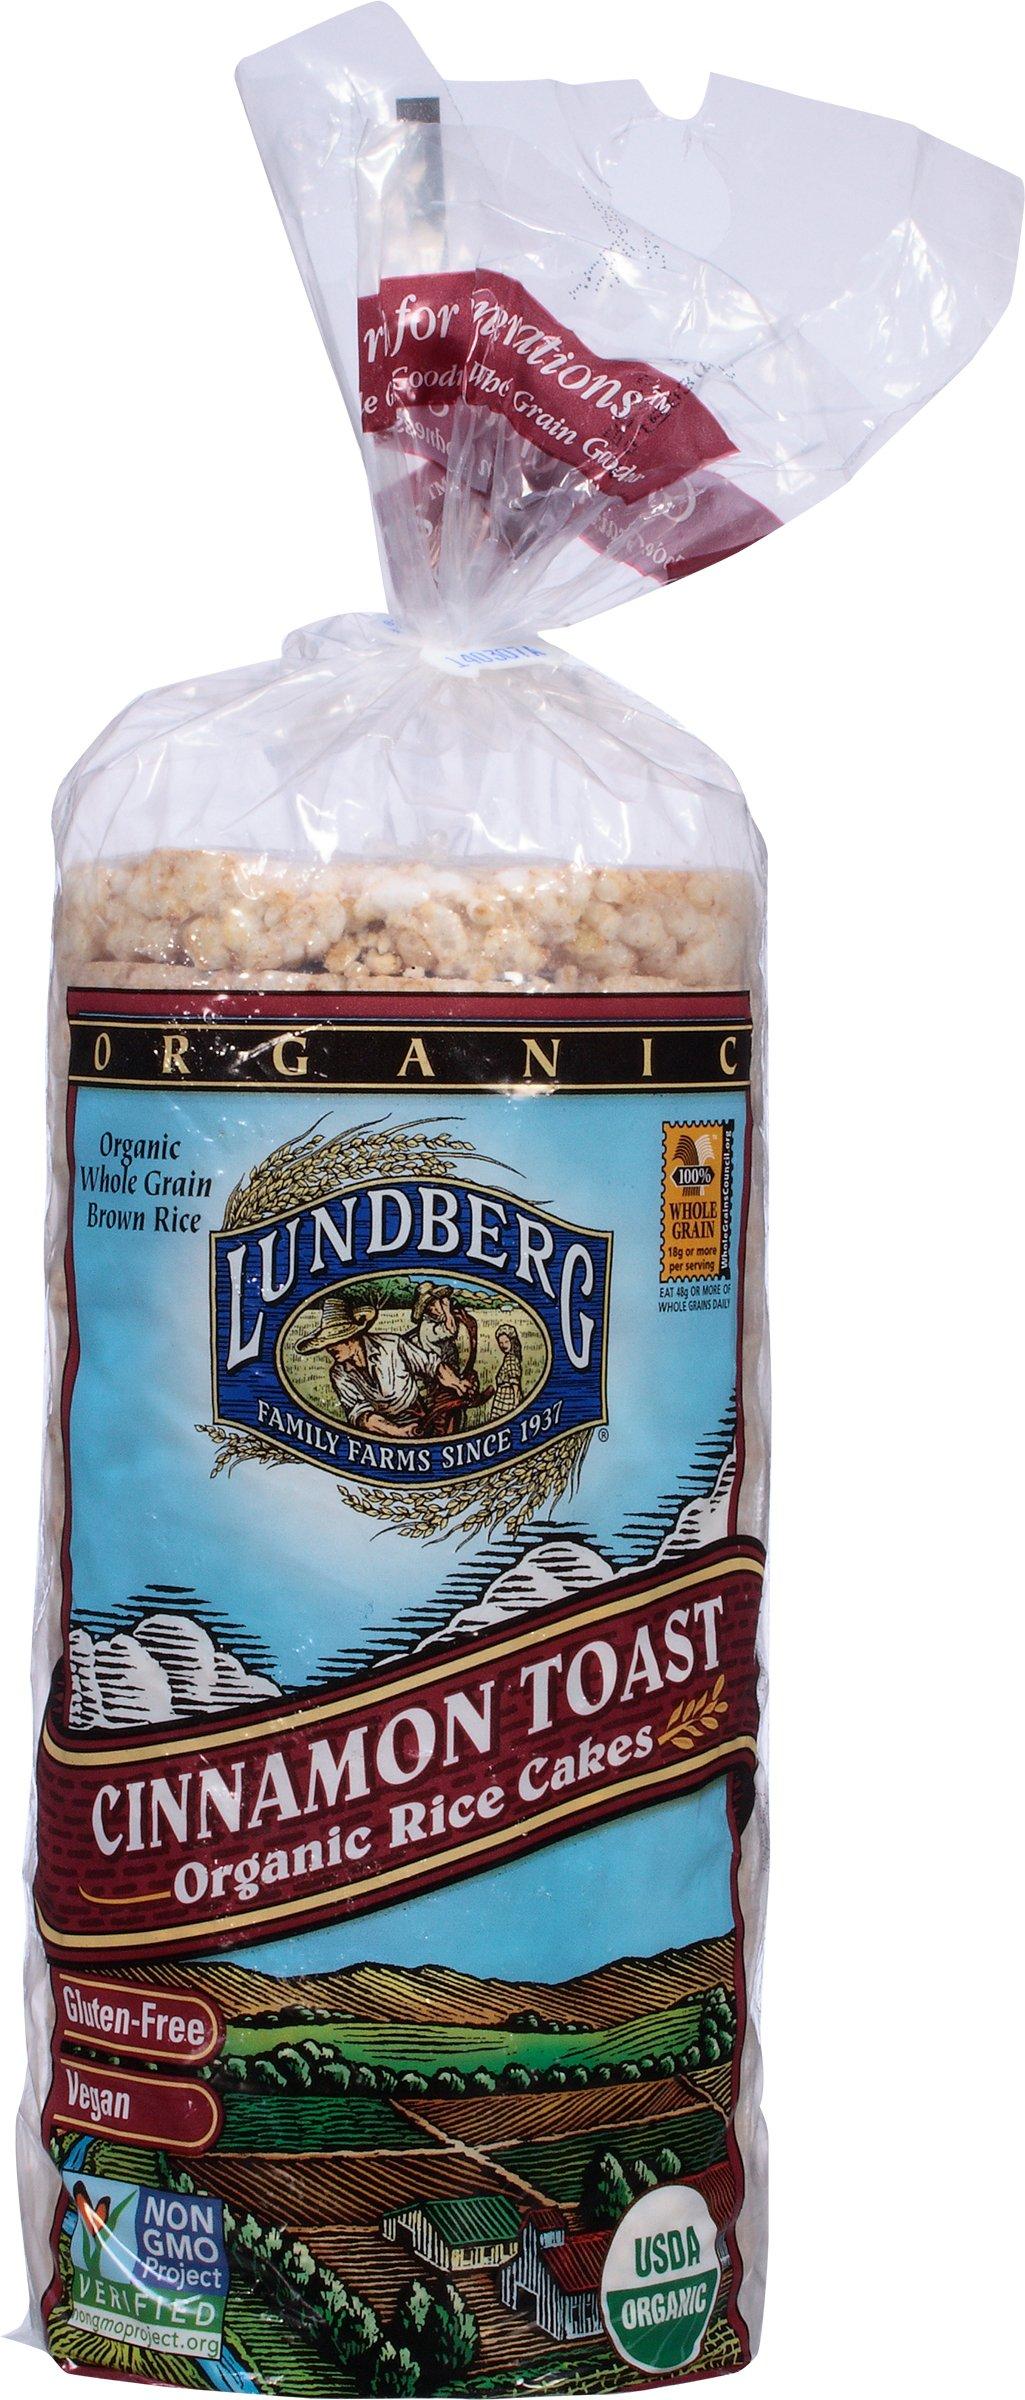 Lundberg Family Farms Organic Cinnamon Toast Rice Cake, 9.5 oz